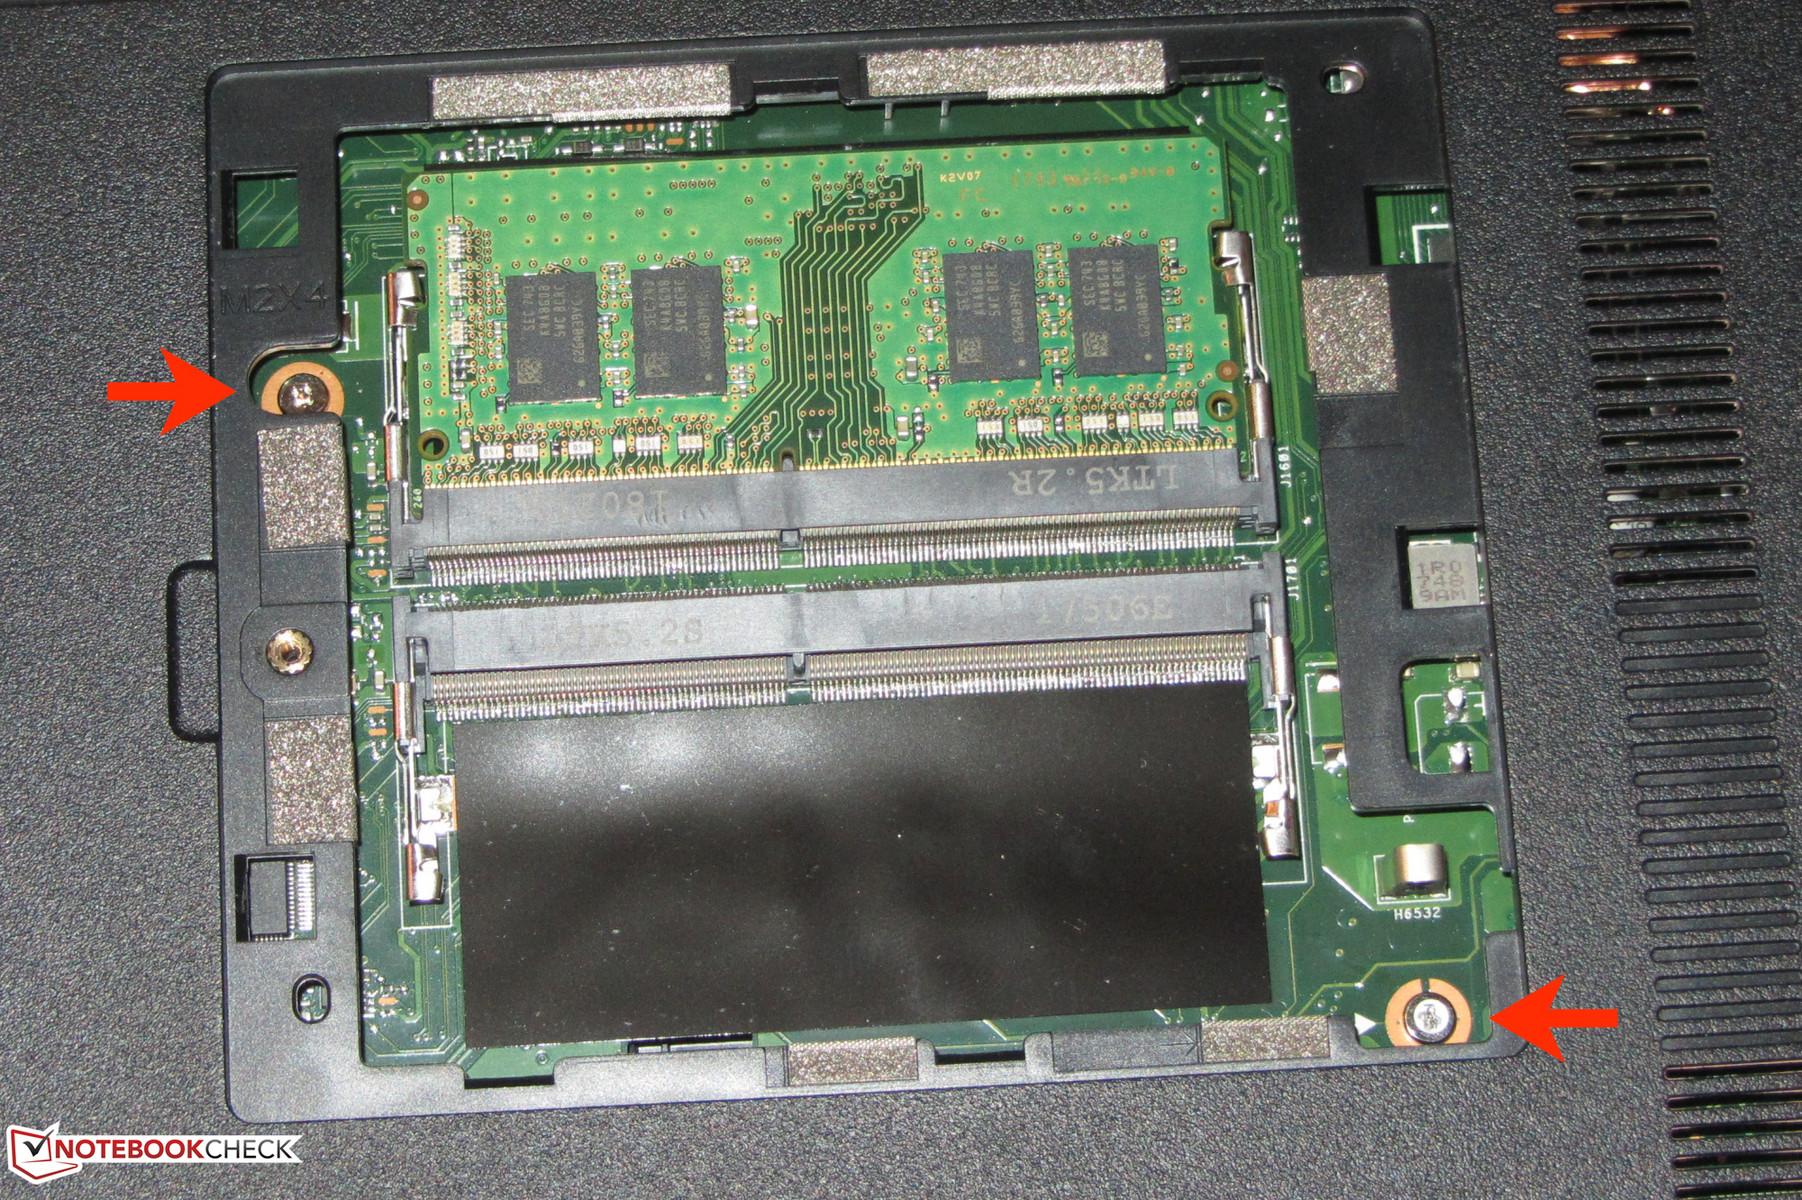 ASUS VivoBook 15 X542UF (i5-8250U, MX130, SSD, FHD) Laptop Review